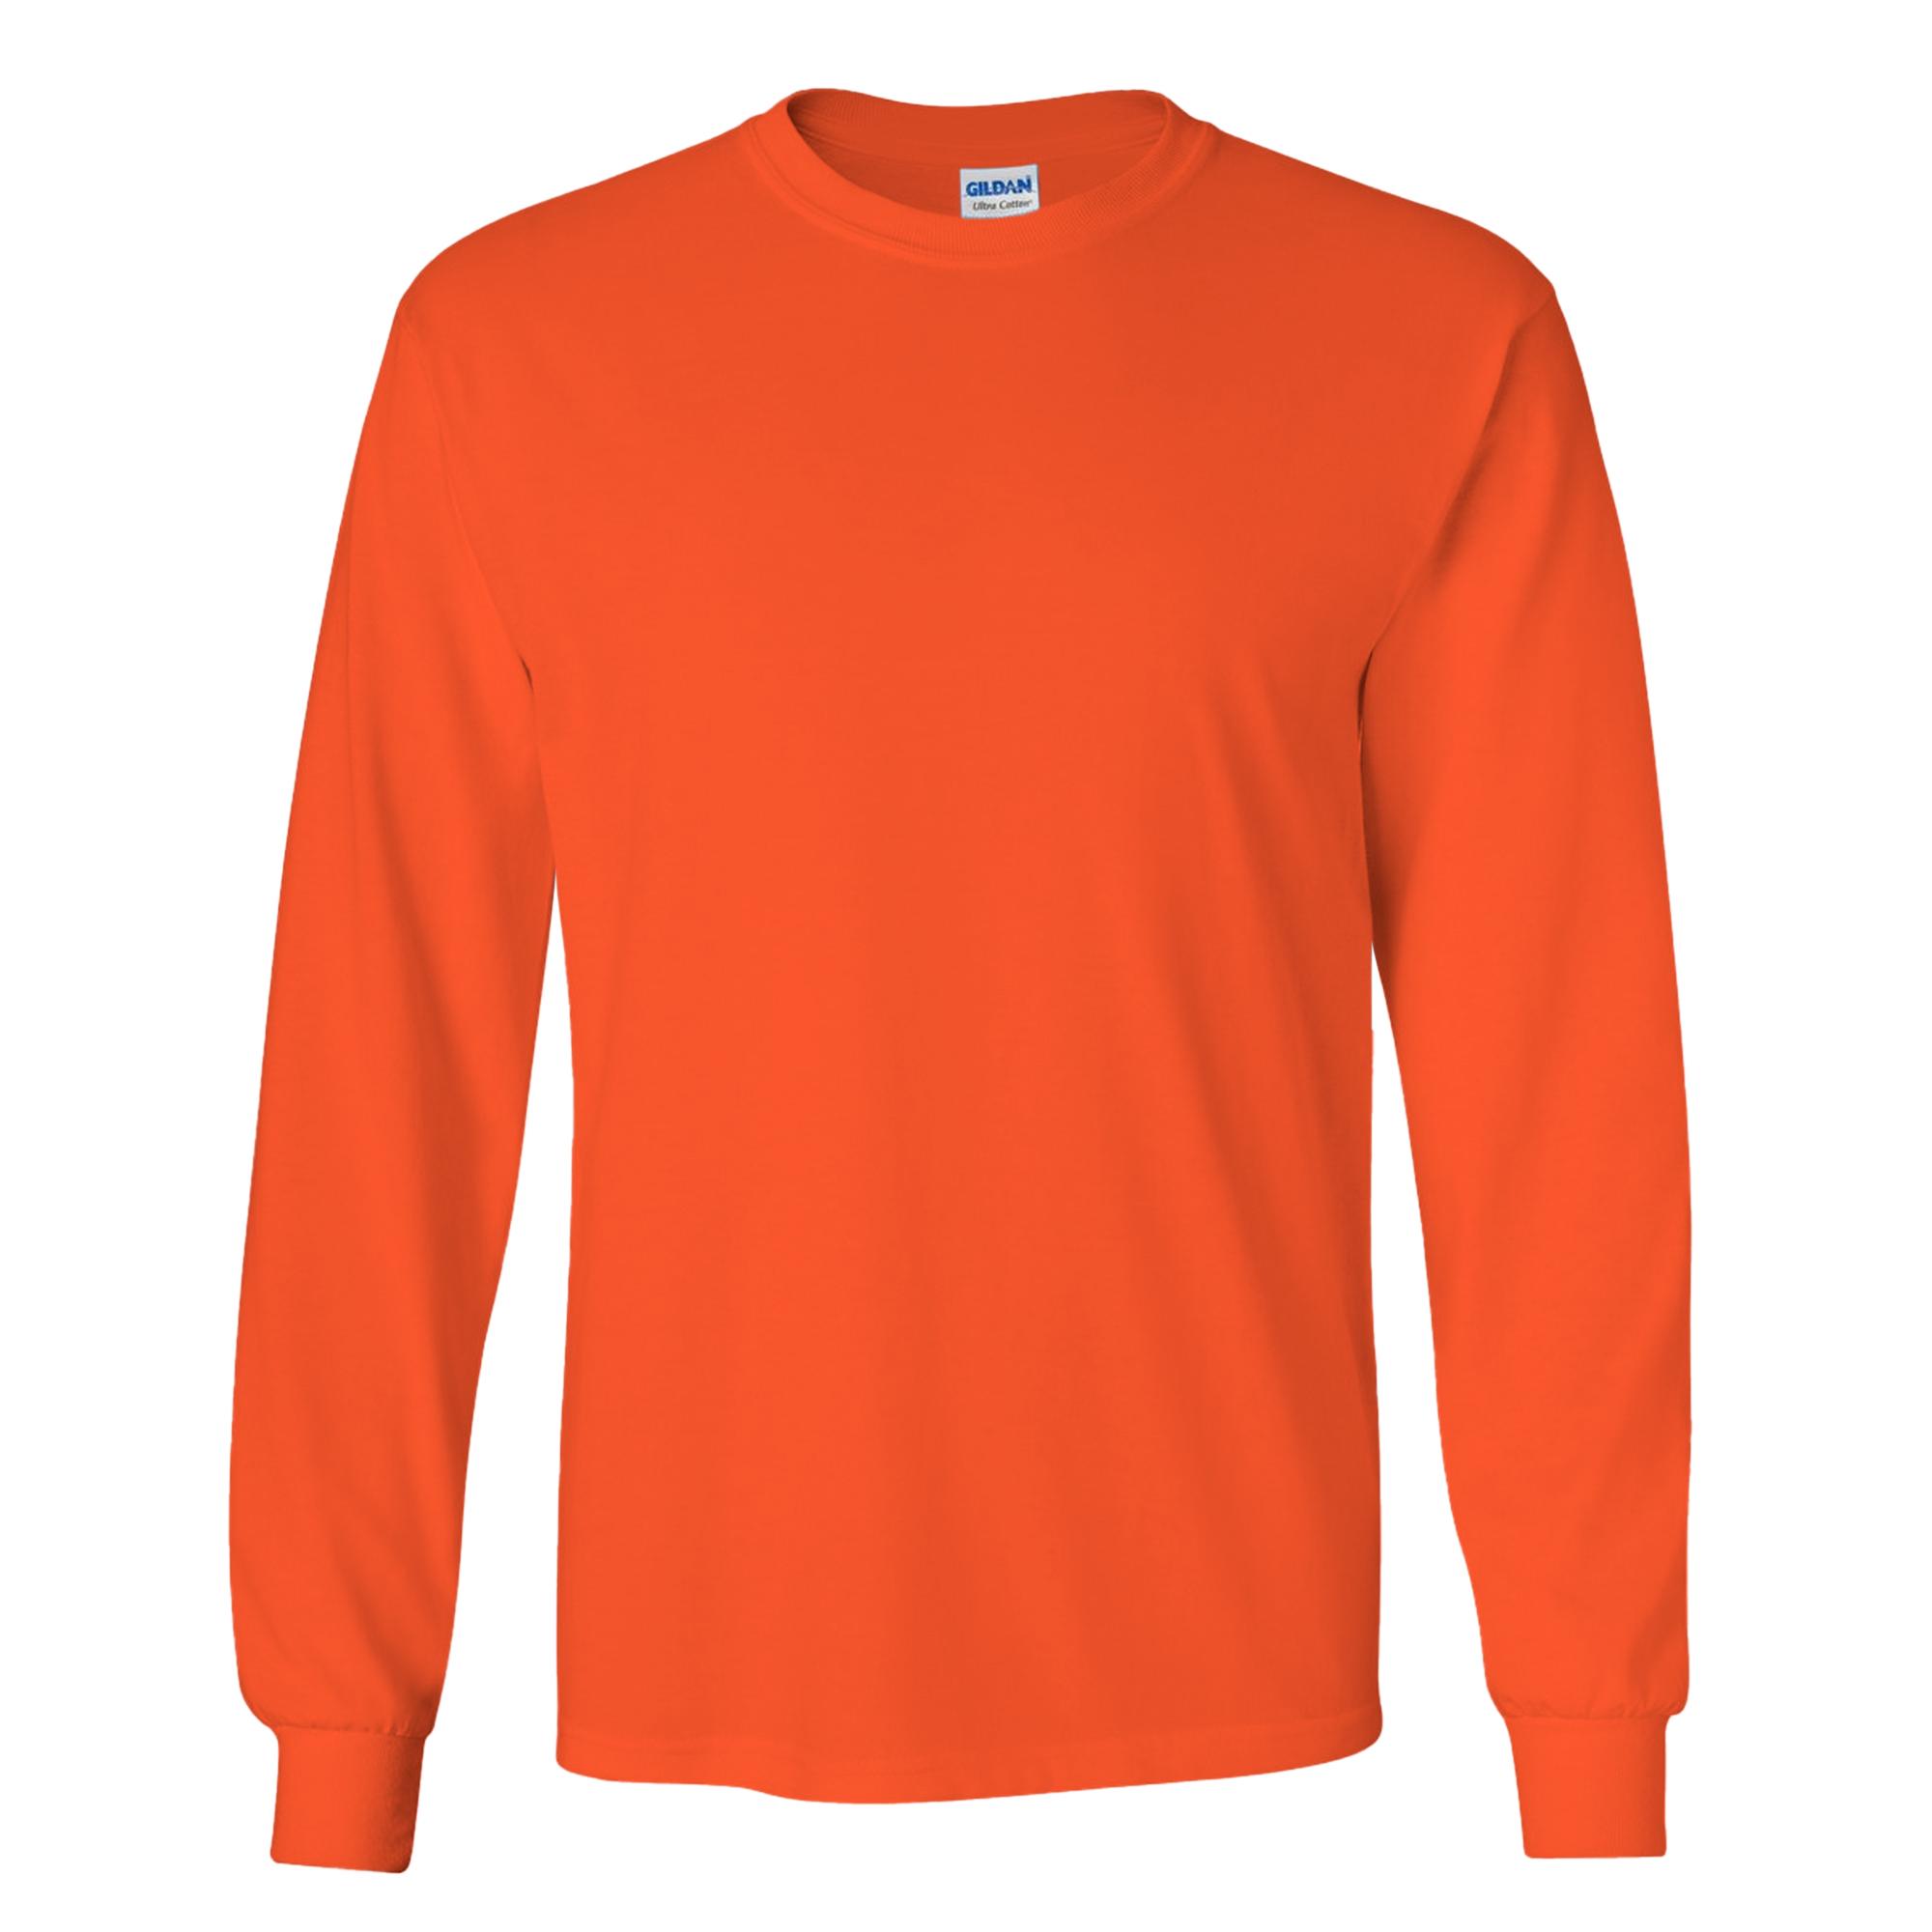 Gildan Mens Plain Crew Neck Ultra Cotton Long Sleeve T-Shirt ...